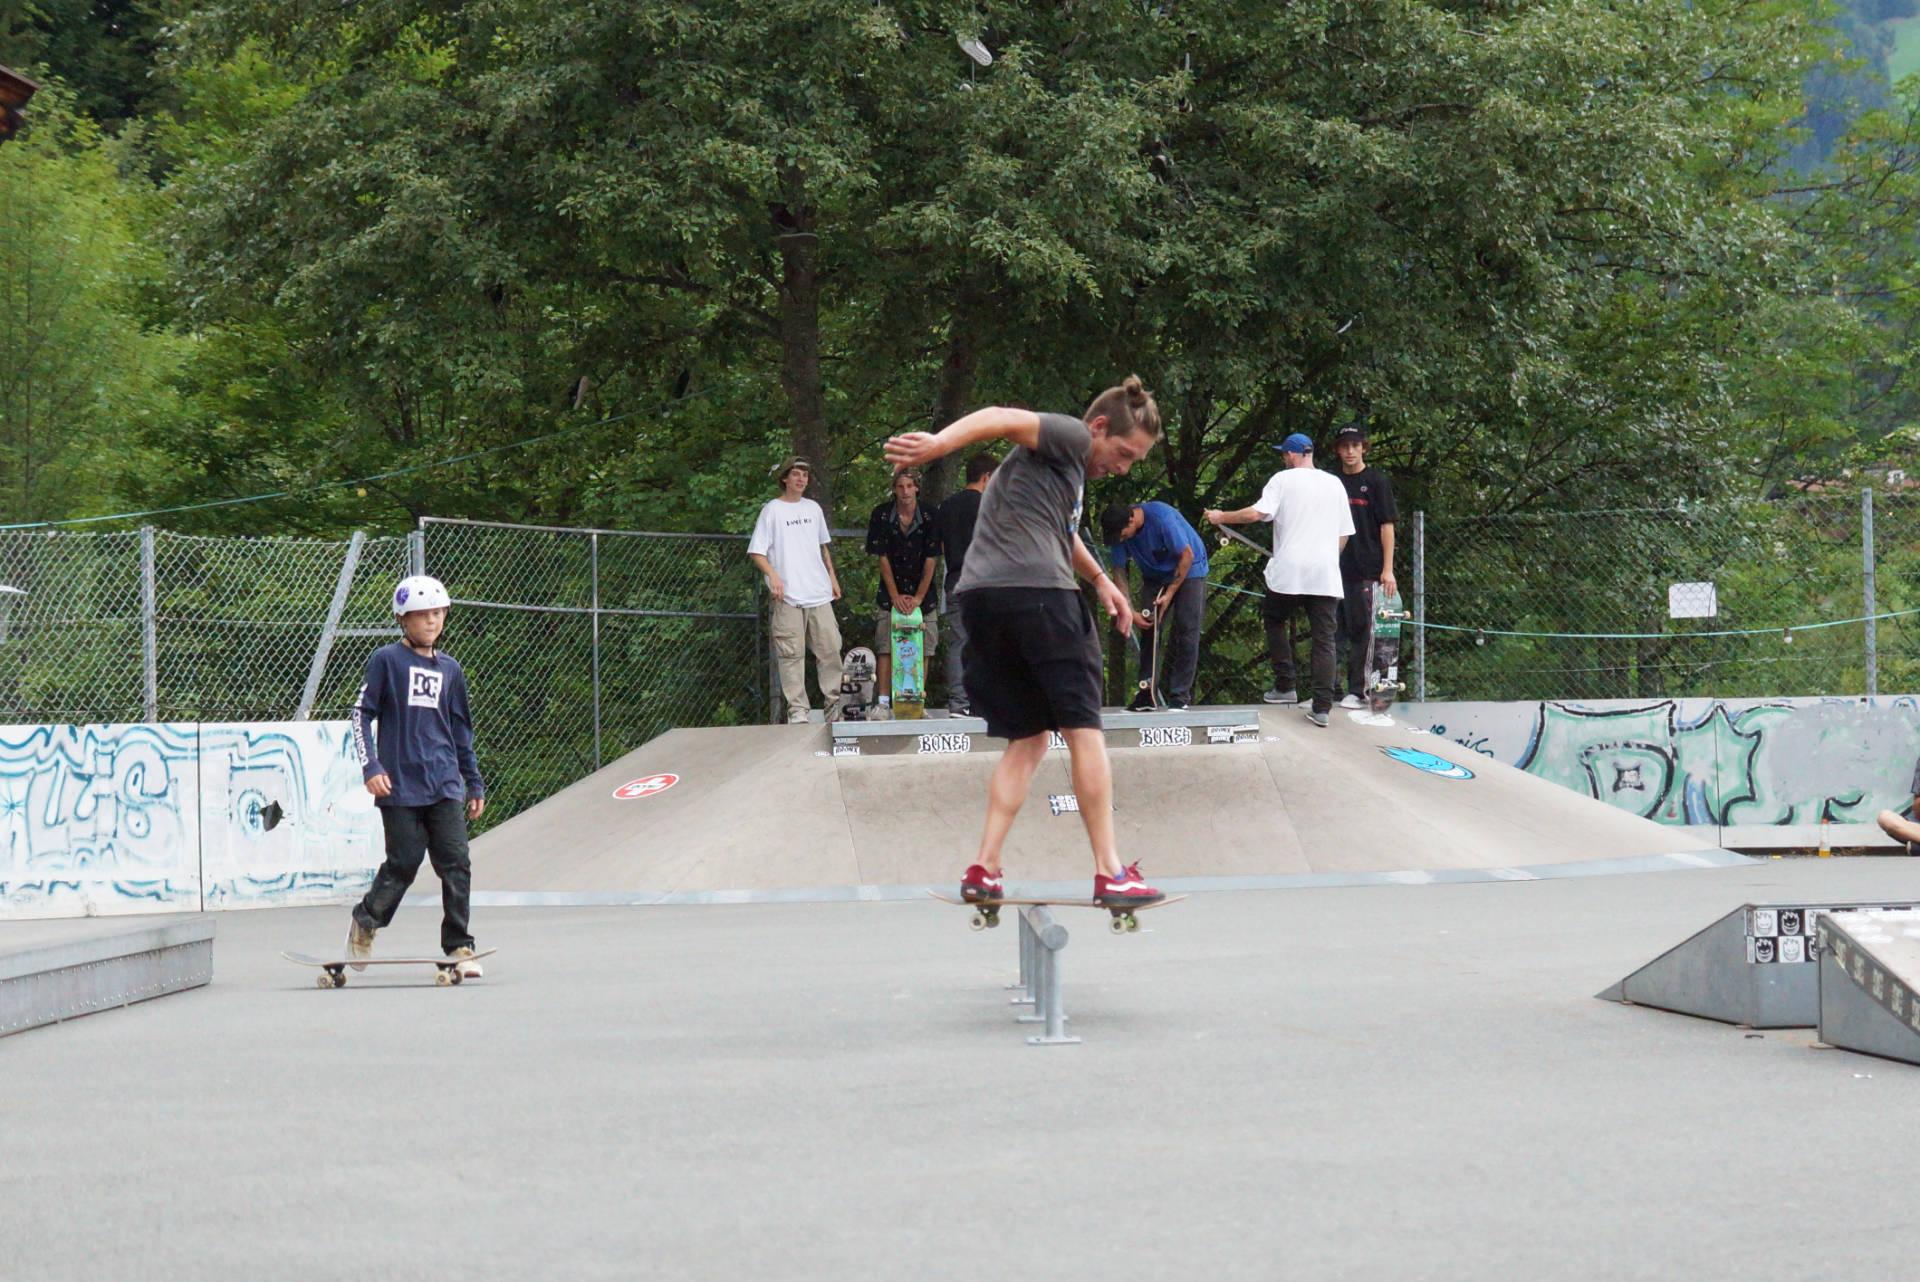 skateboardheadz fieberbrunn kgt 2019 finale 00004